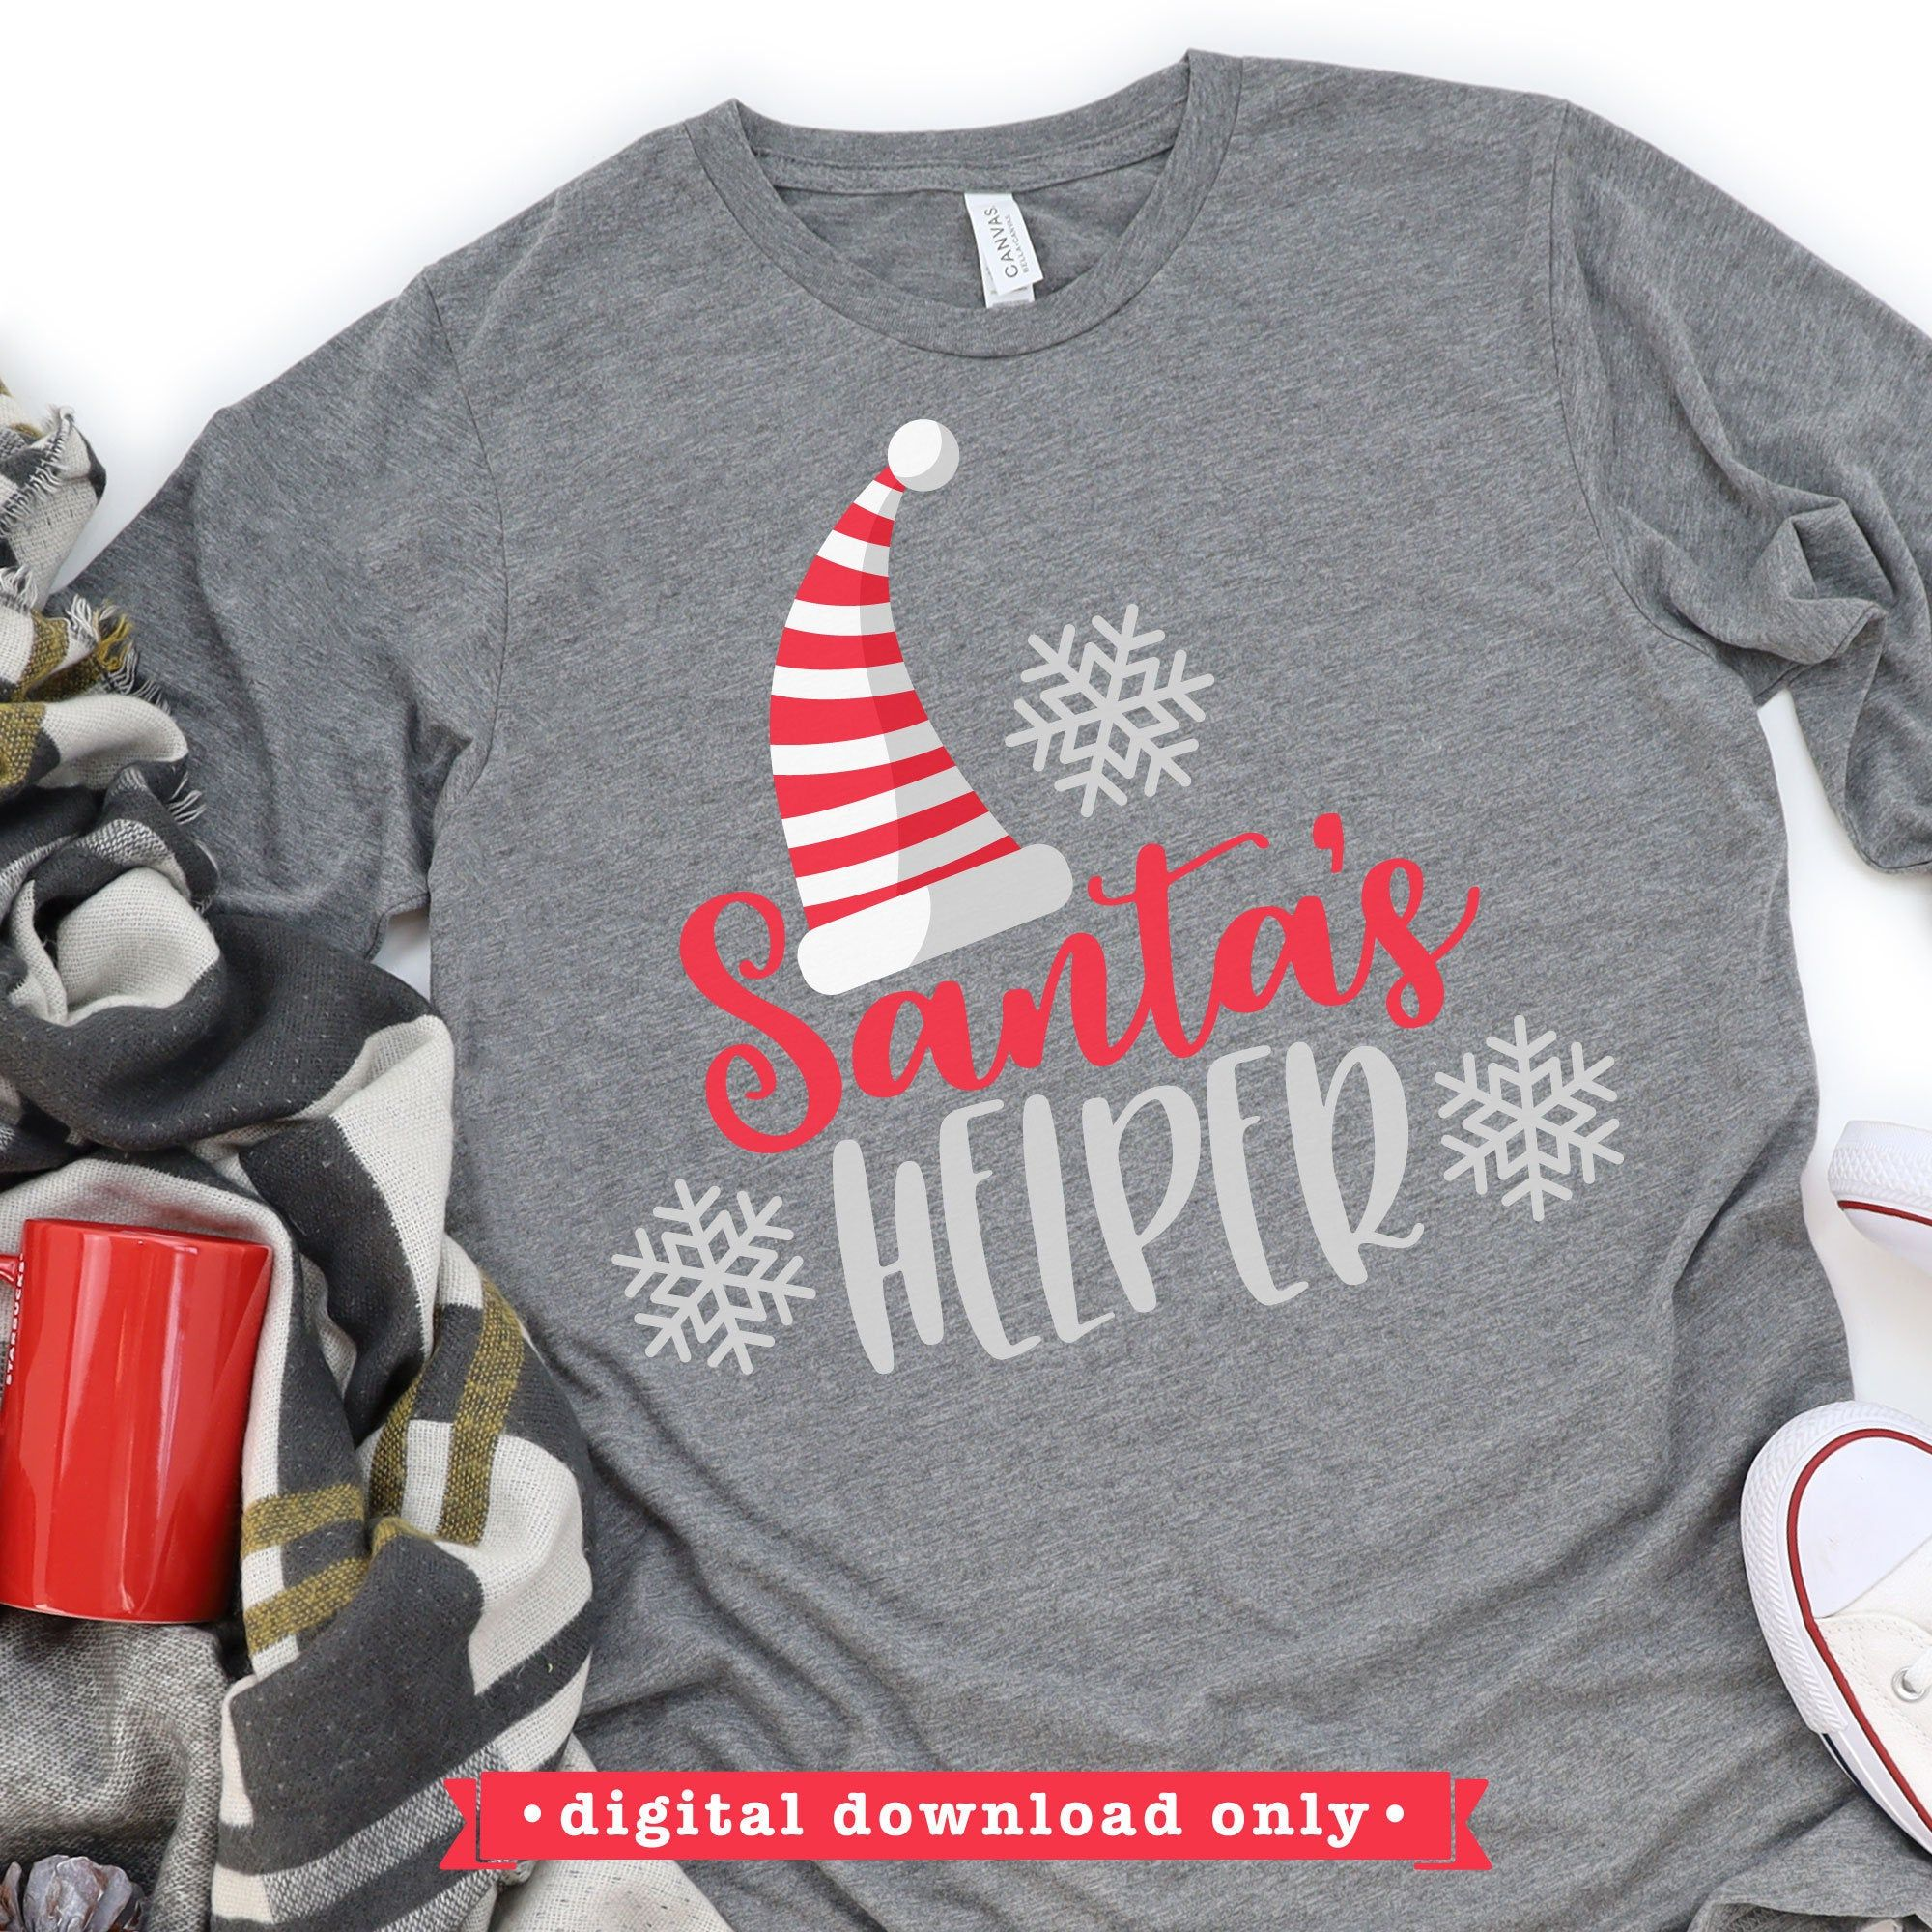 Merry Christmas svg Christmas SVG cut file Santa hat svg perfect for shirts Nice List Dropout SVG design Christmas cut file